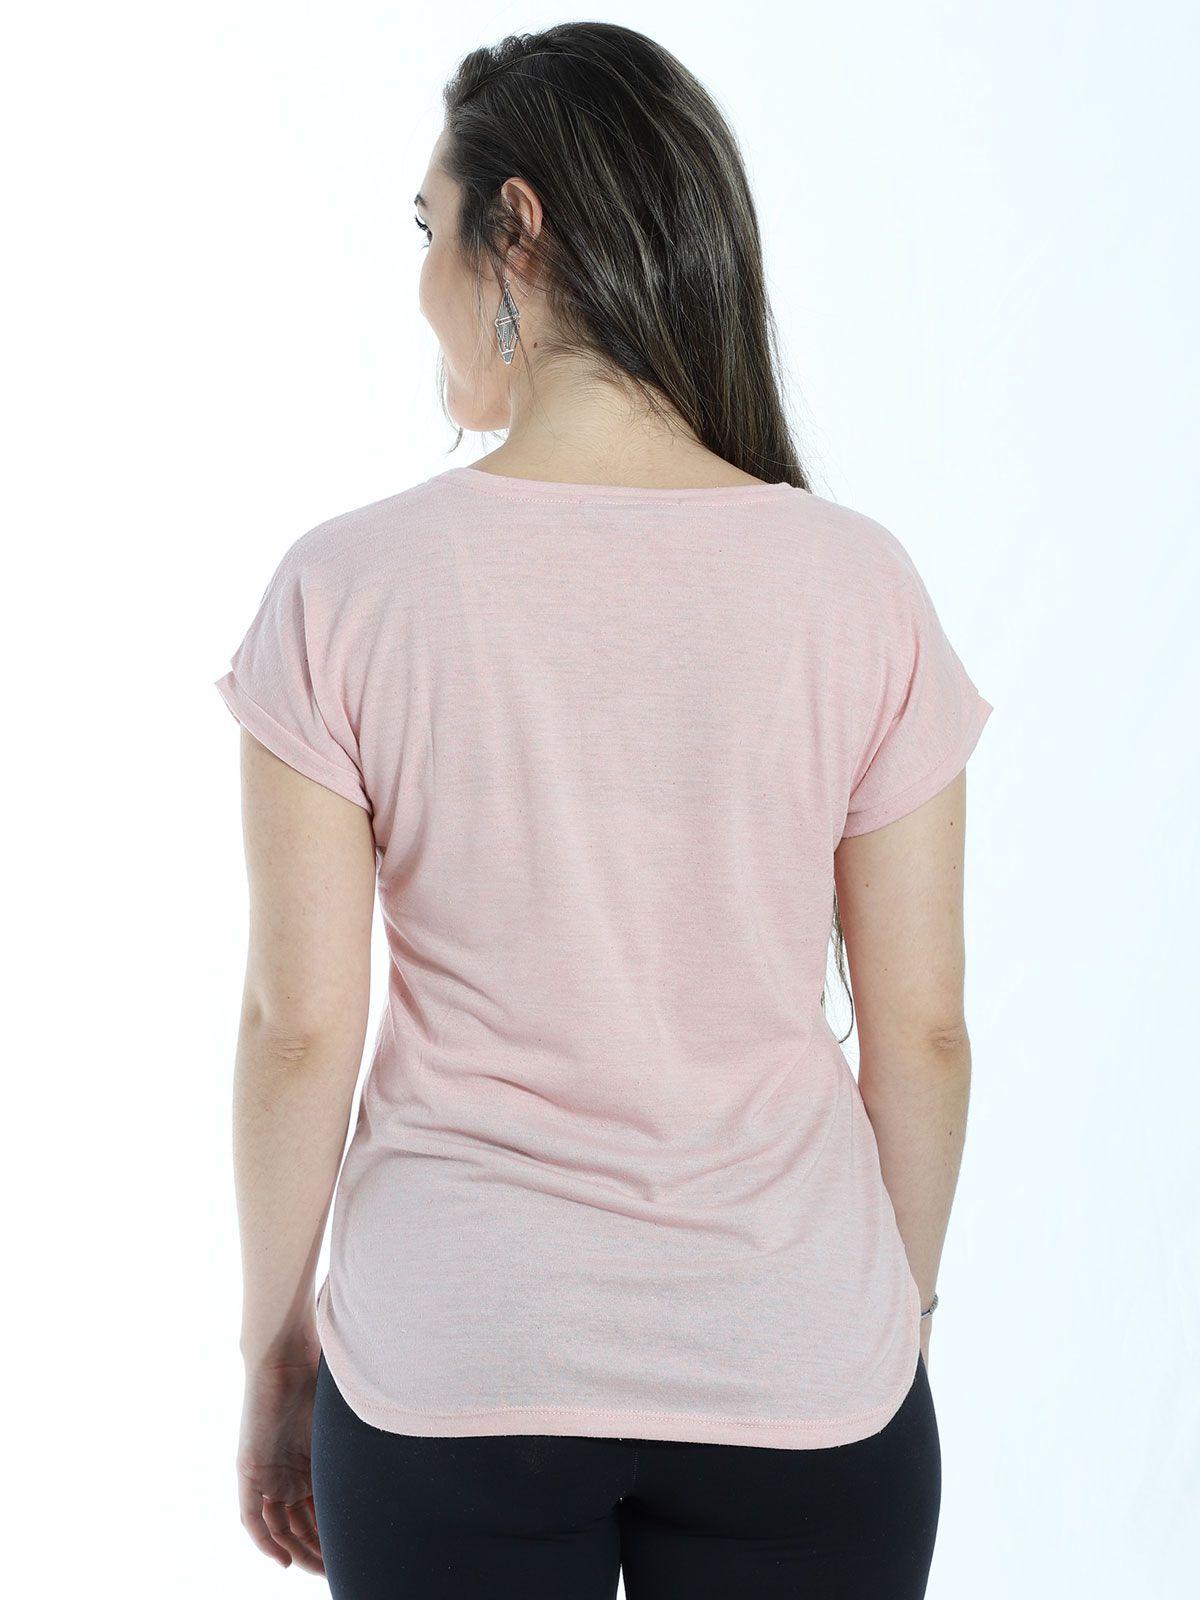 Blusa Anistia Recortes Ombro Rosa